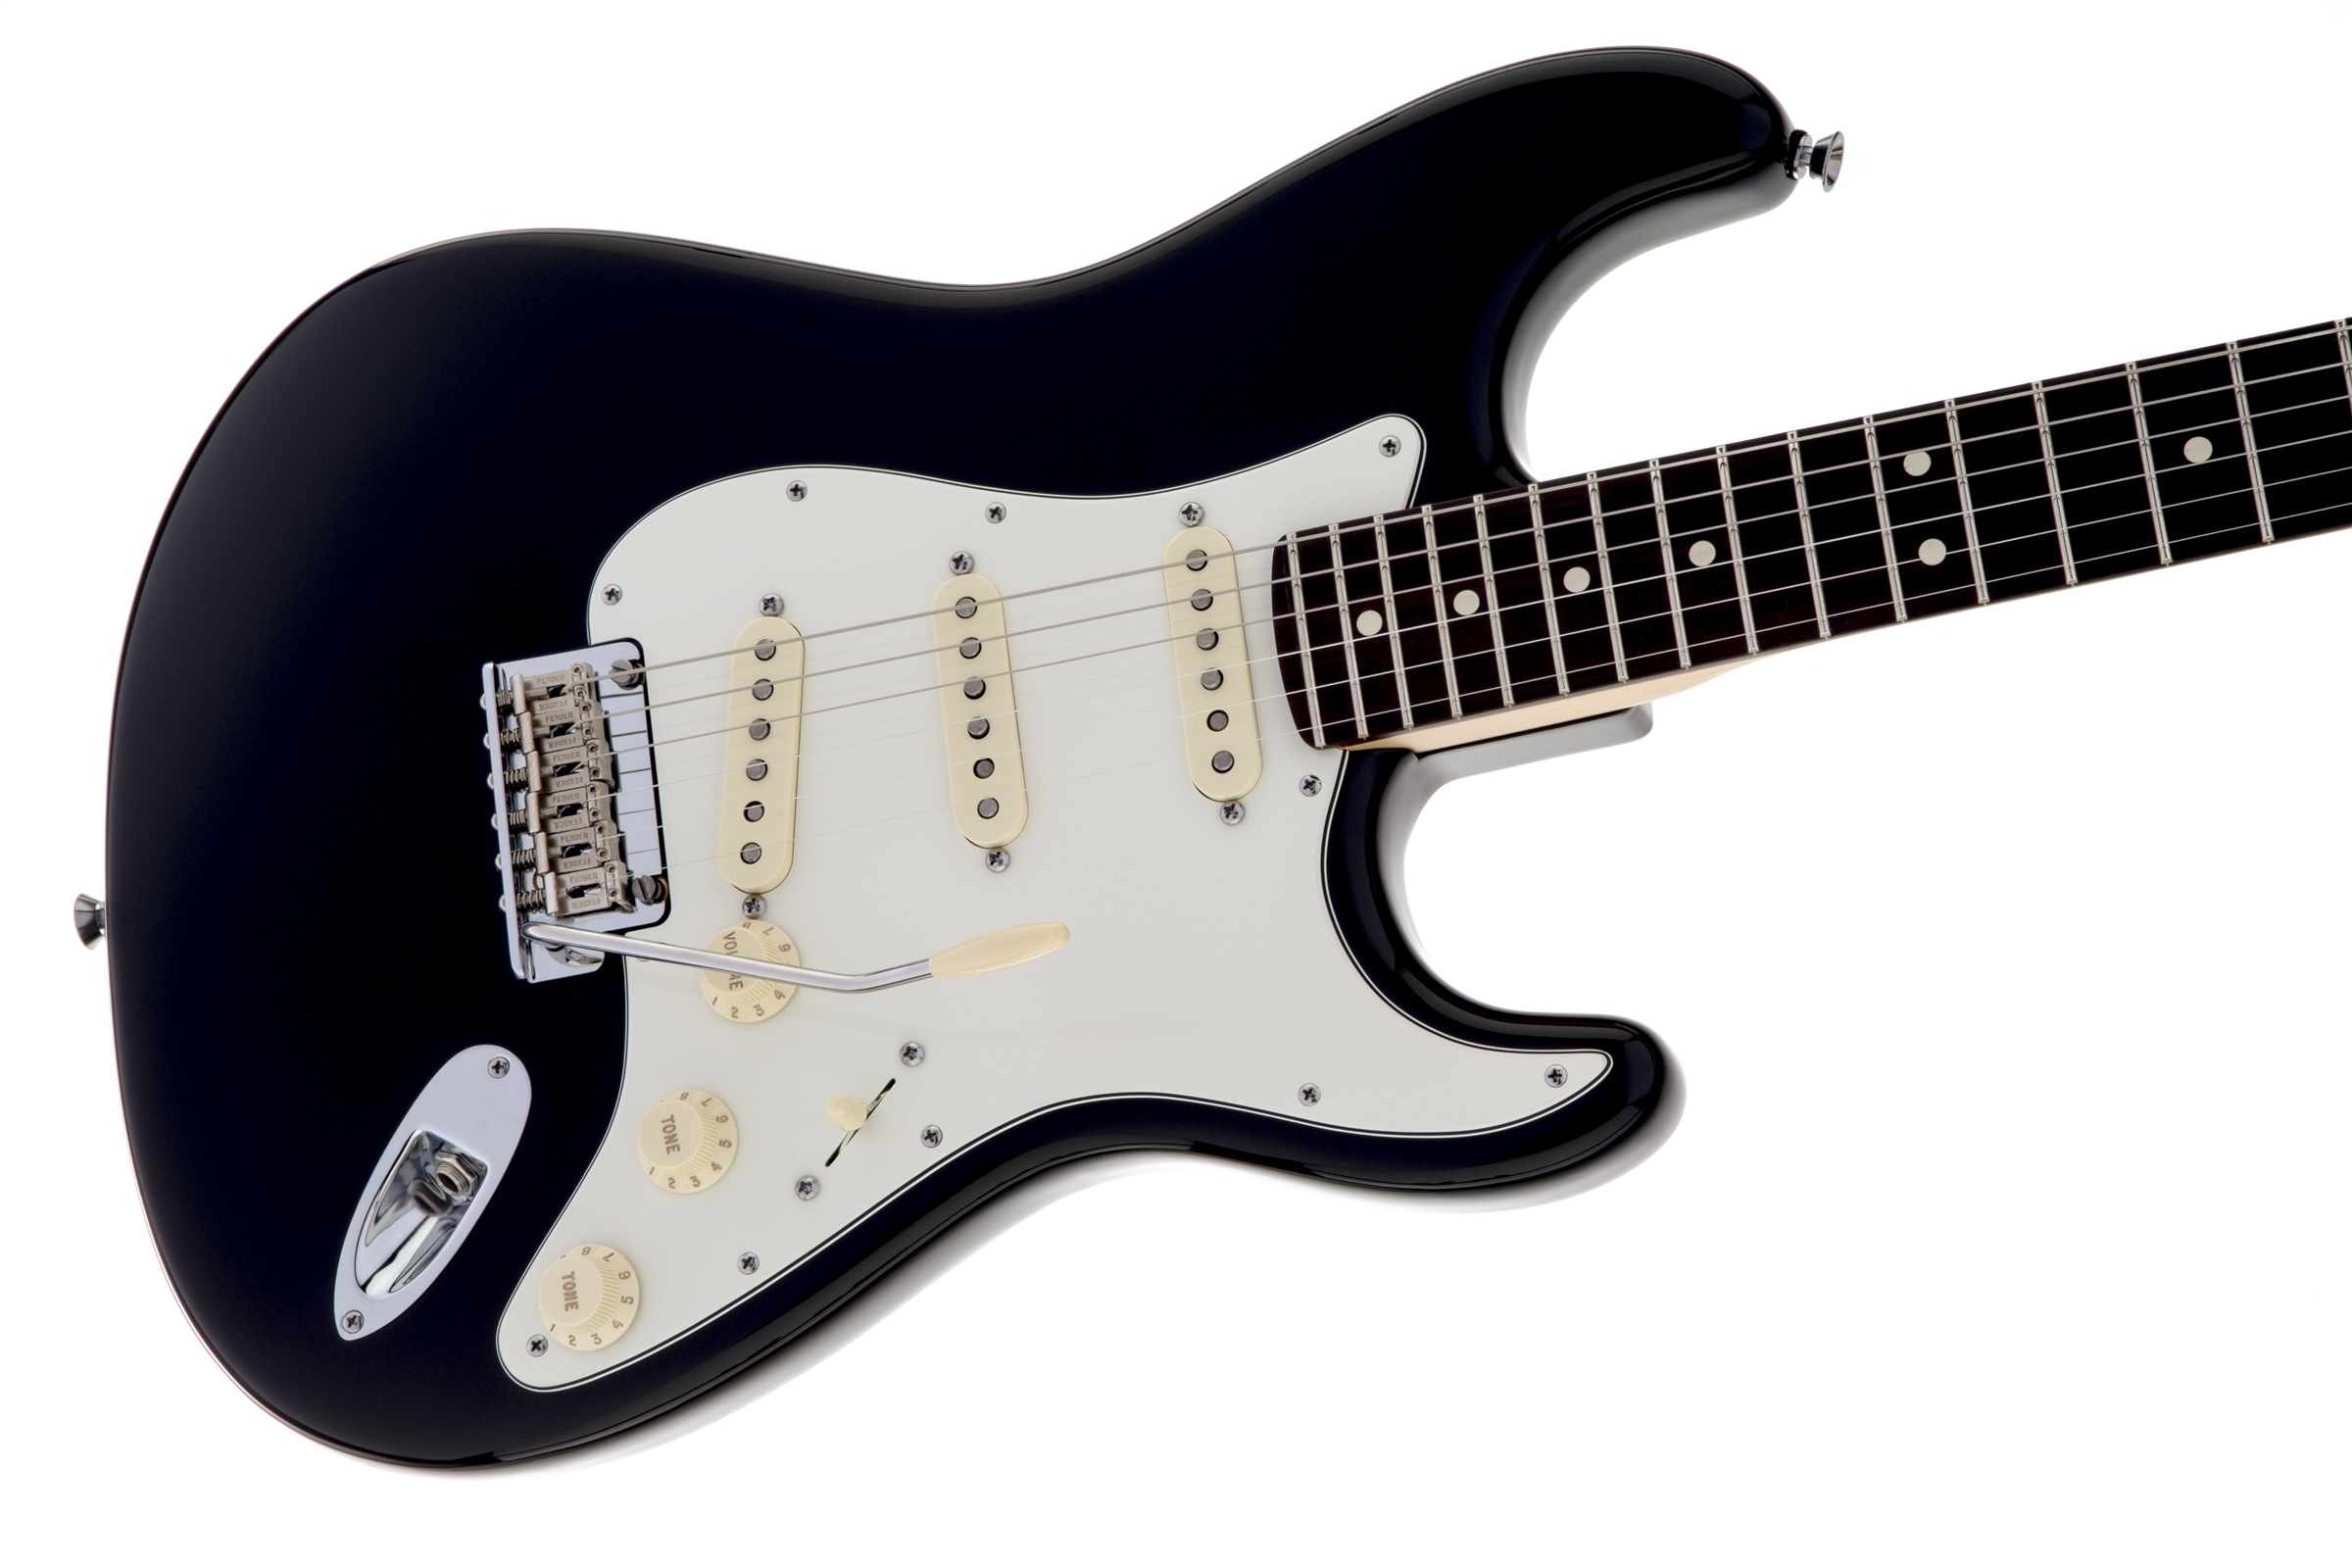 Fender American Standard Stratocaster Black Rosewood Fingerboard Squier Electric Guitar